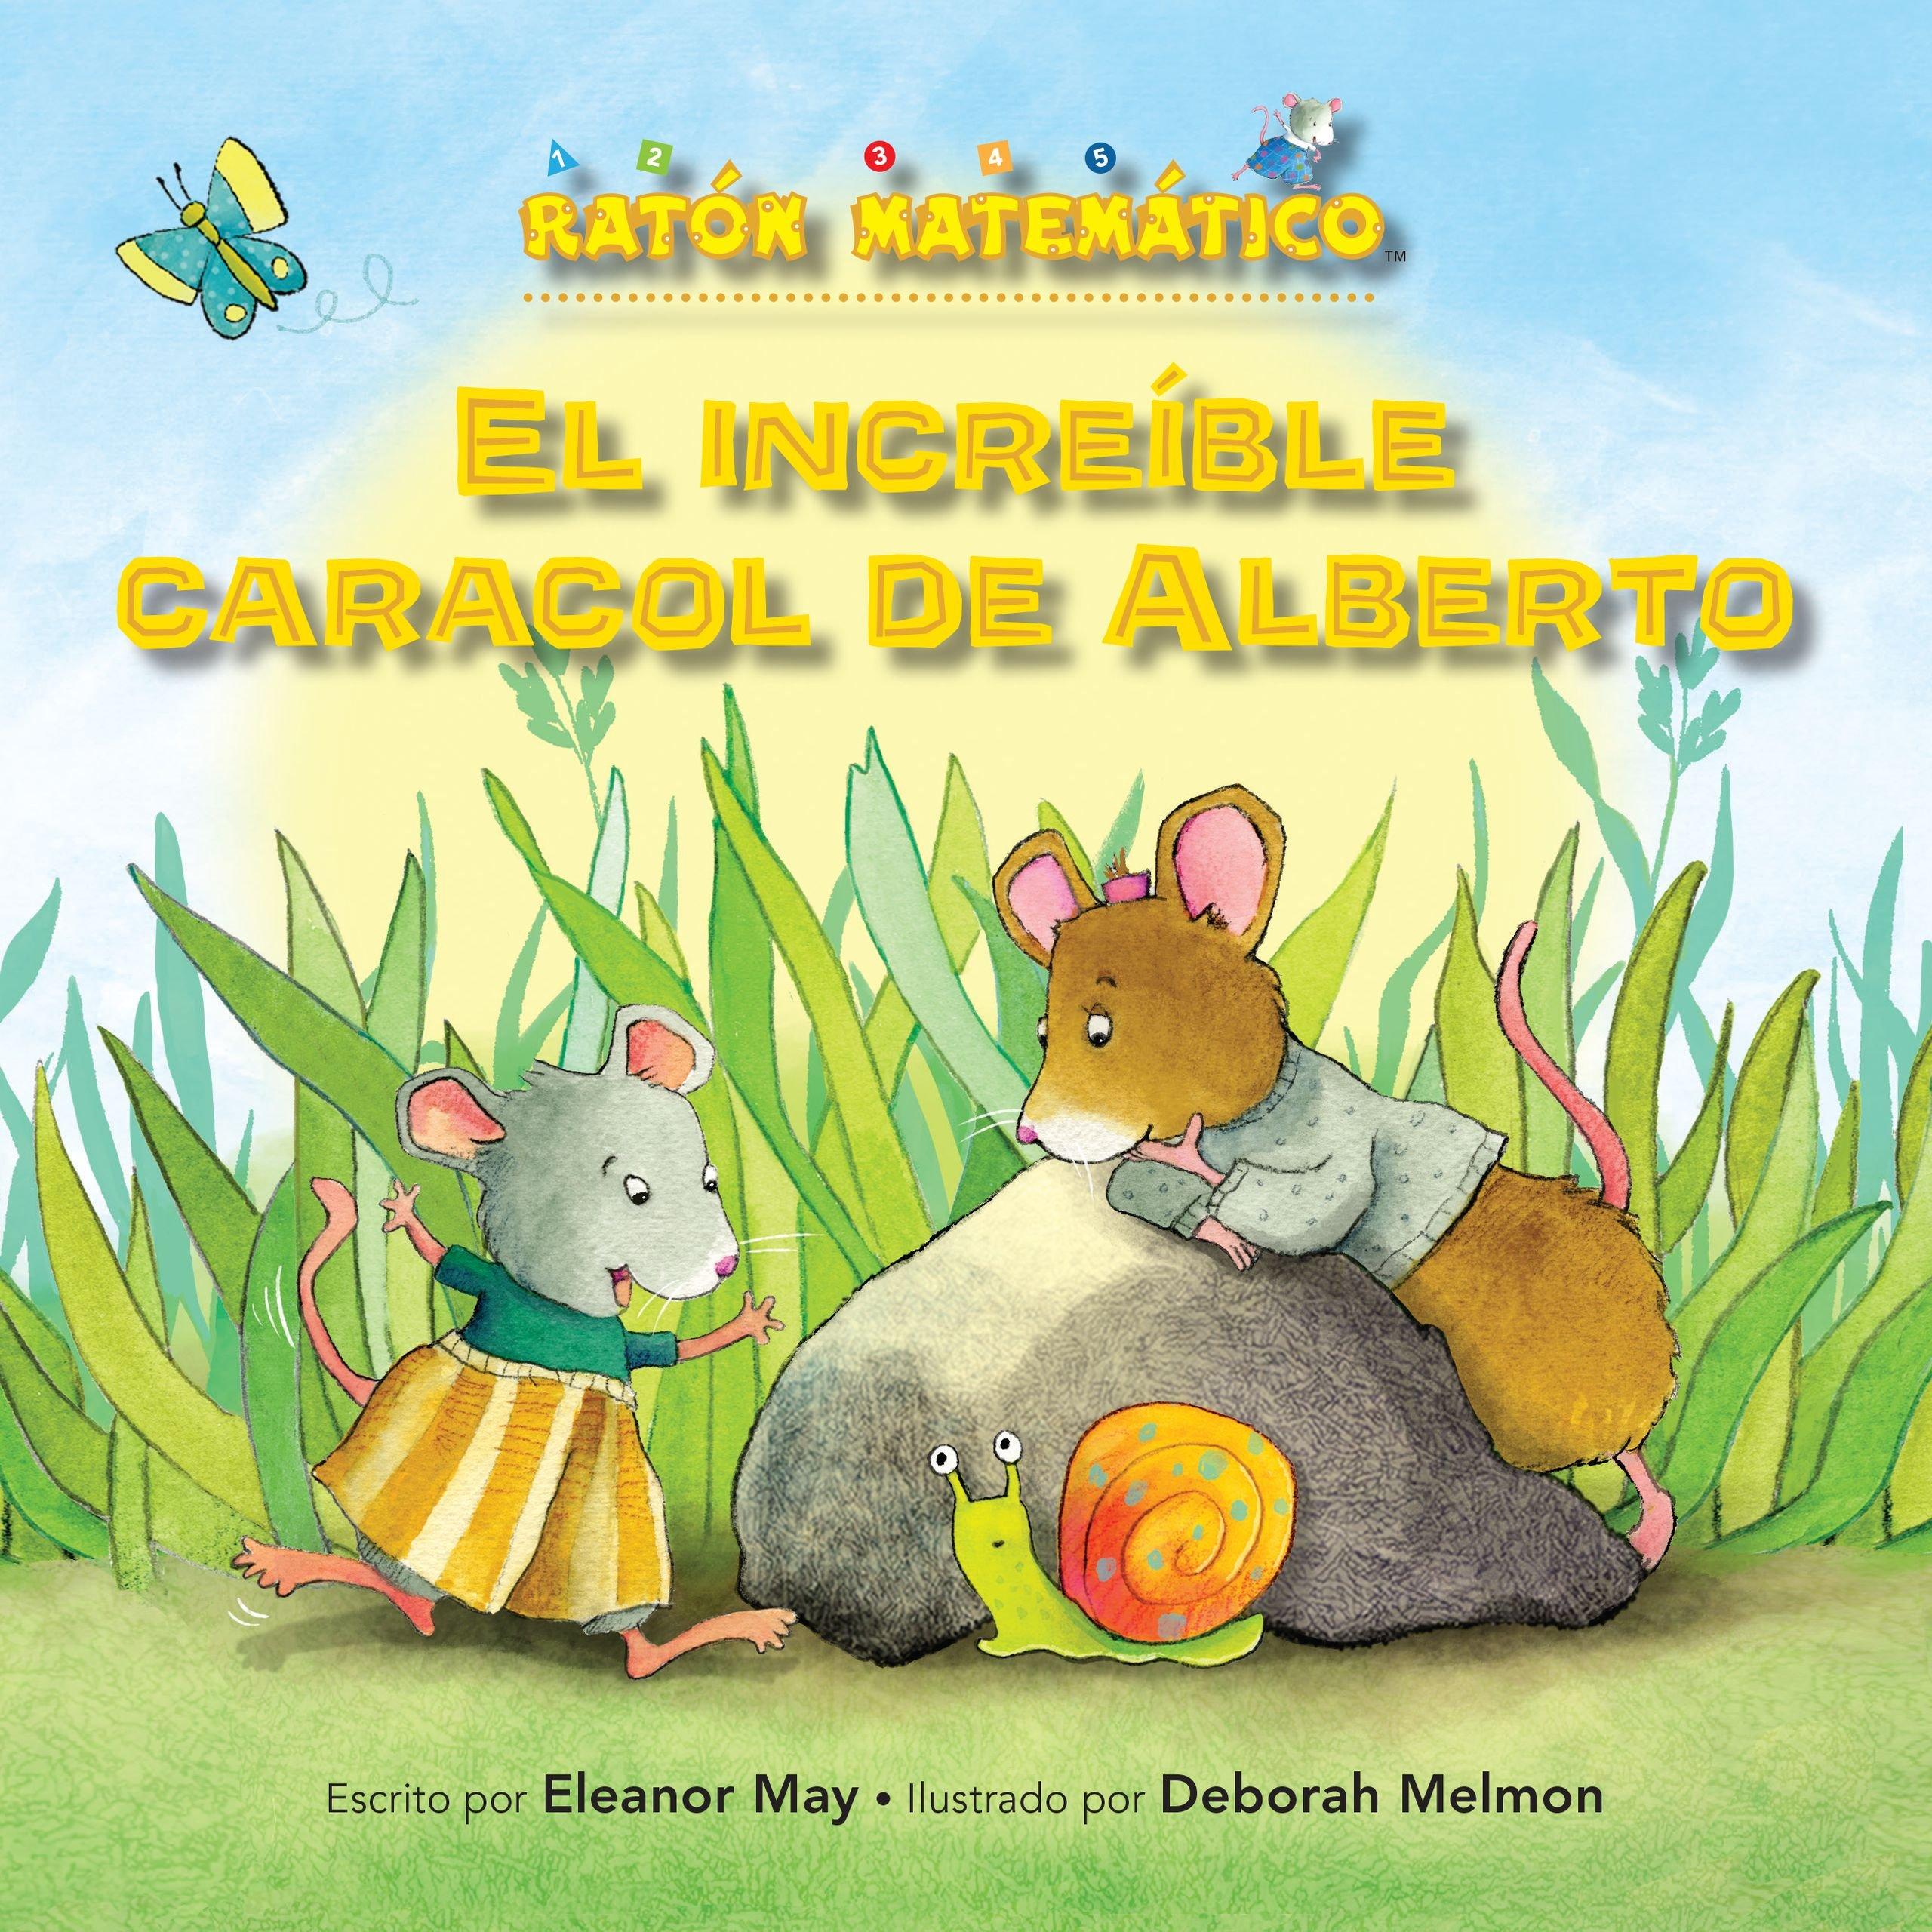 Download El Increíble Caracol de Alberto (Albert's Amazing Snail): Palabras de Posición (Position Words) (Ratón Matemático (Mouse Math)) (Spanish Edition) pdf